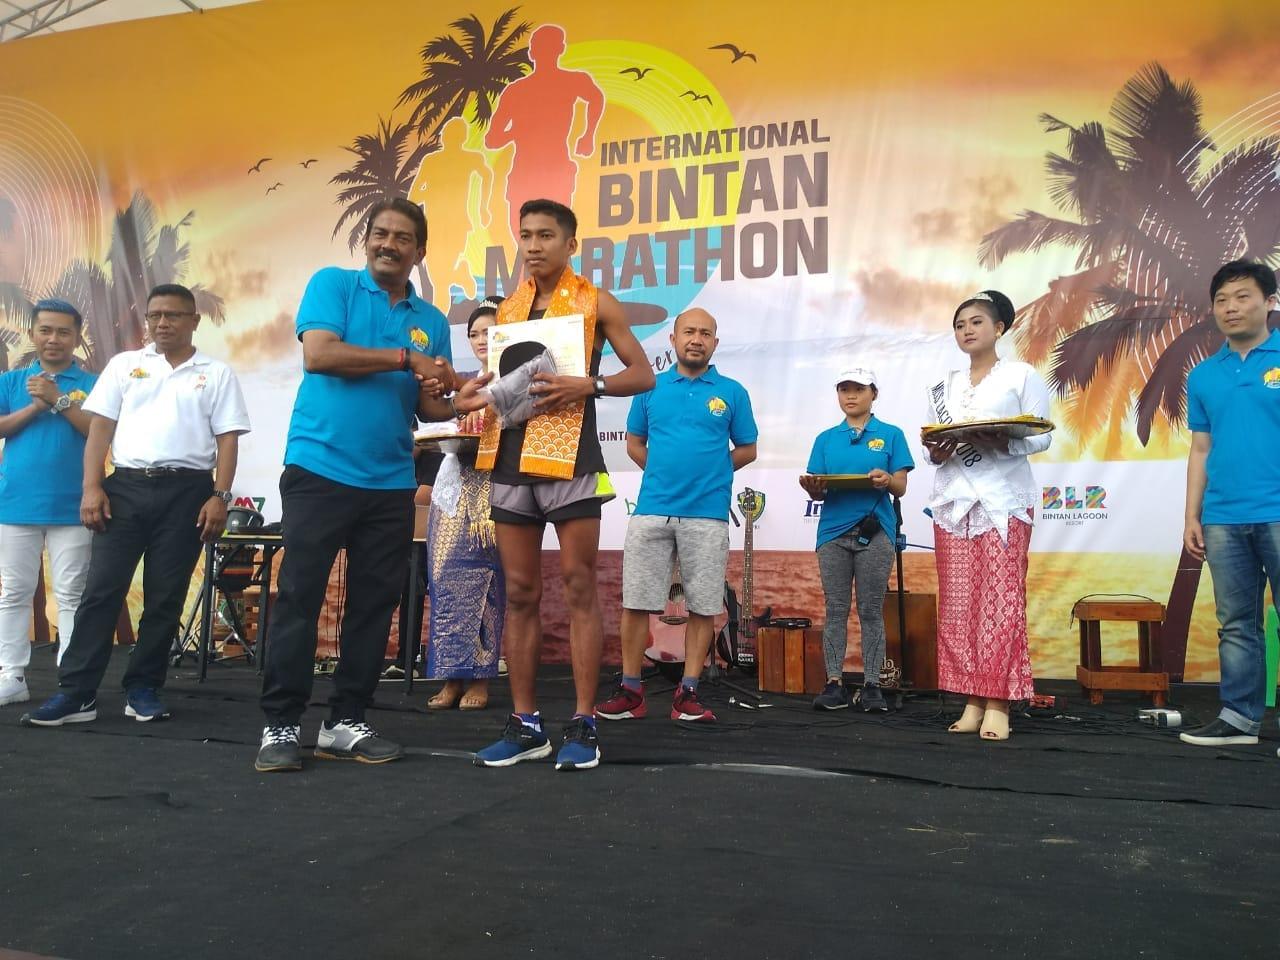 Prada Yusuf Raih Juara III International Bintan Marathon